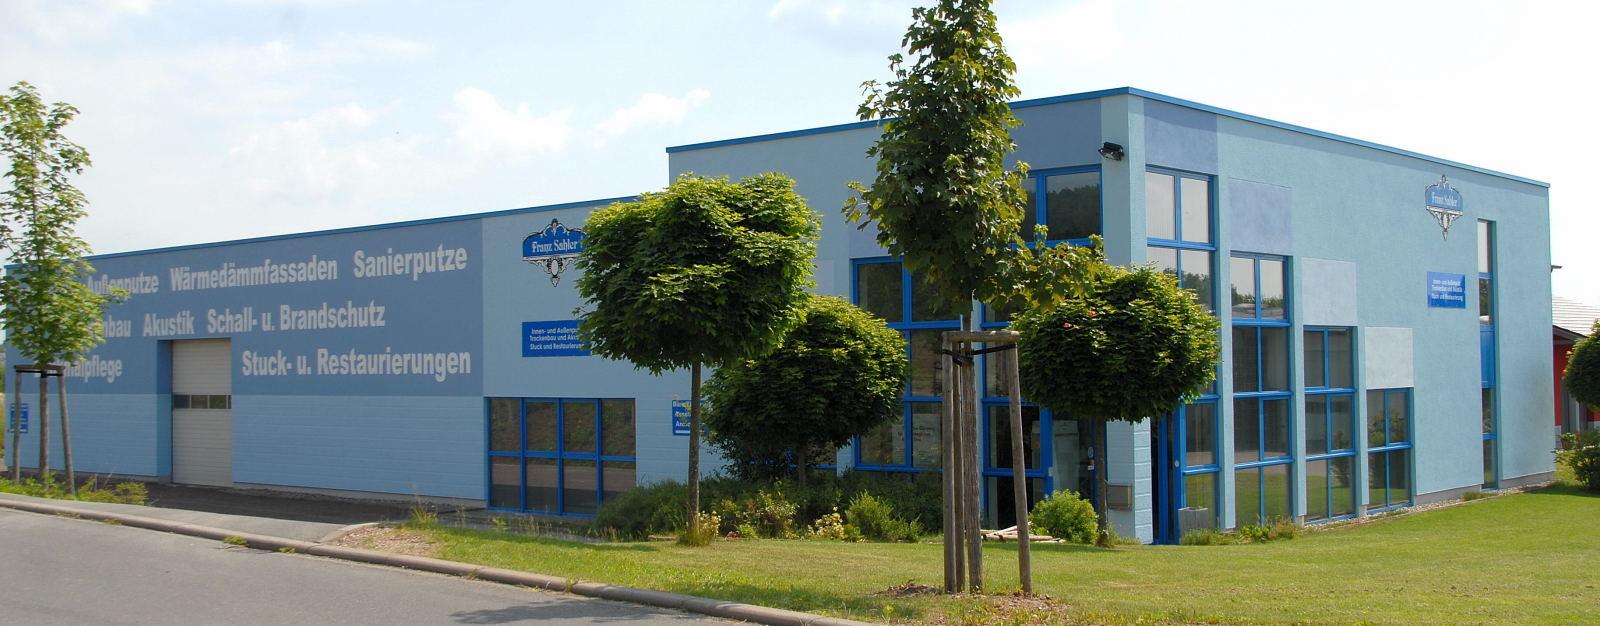 Franz Sahler GmbH